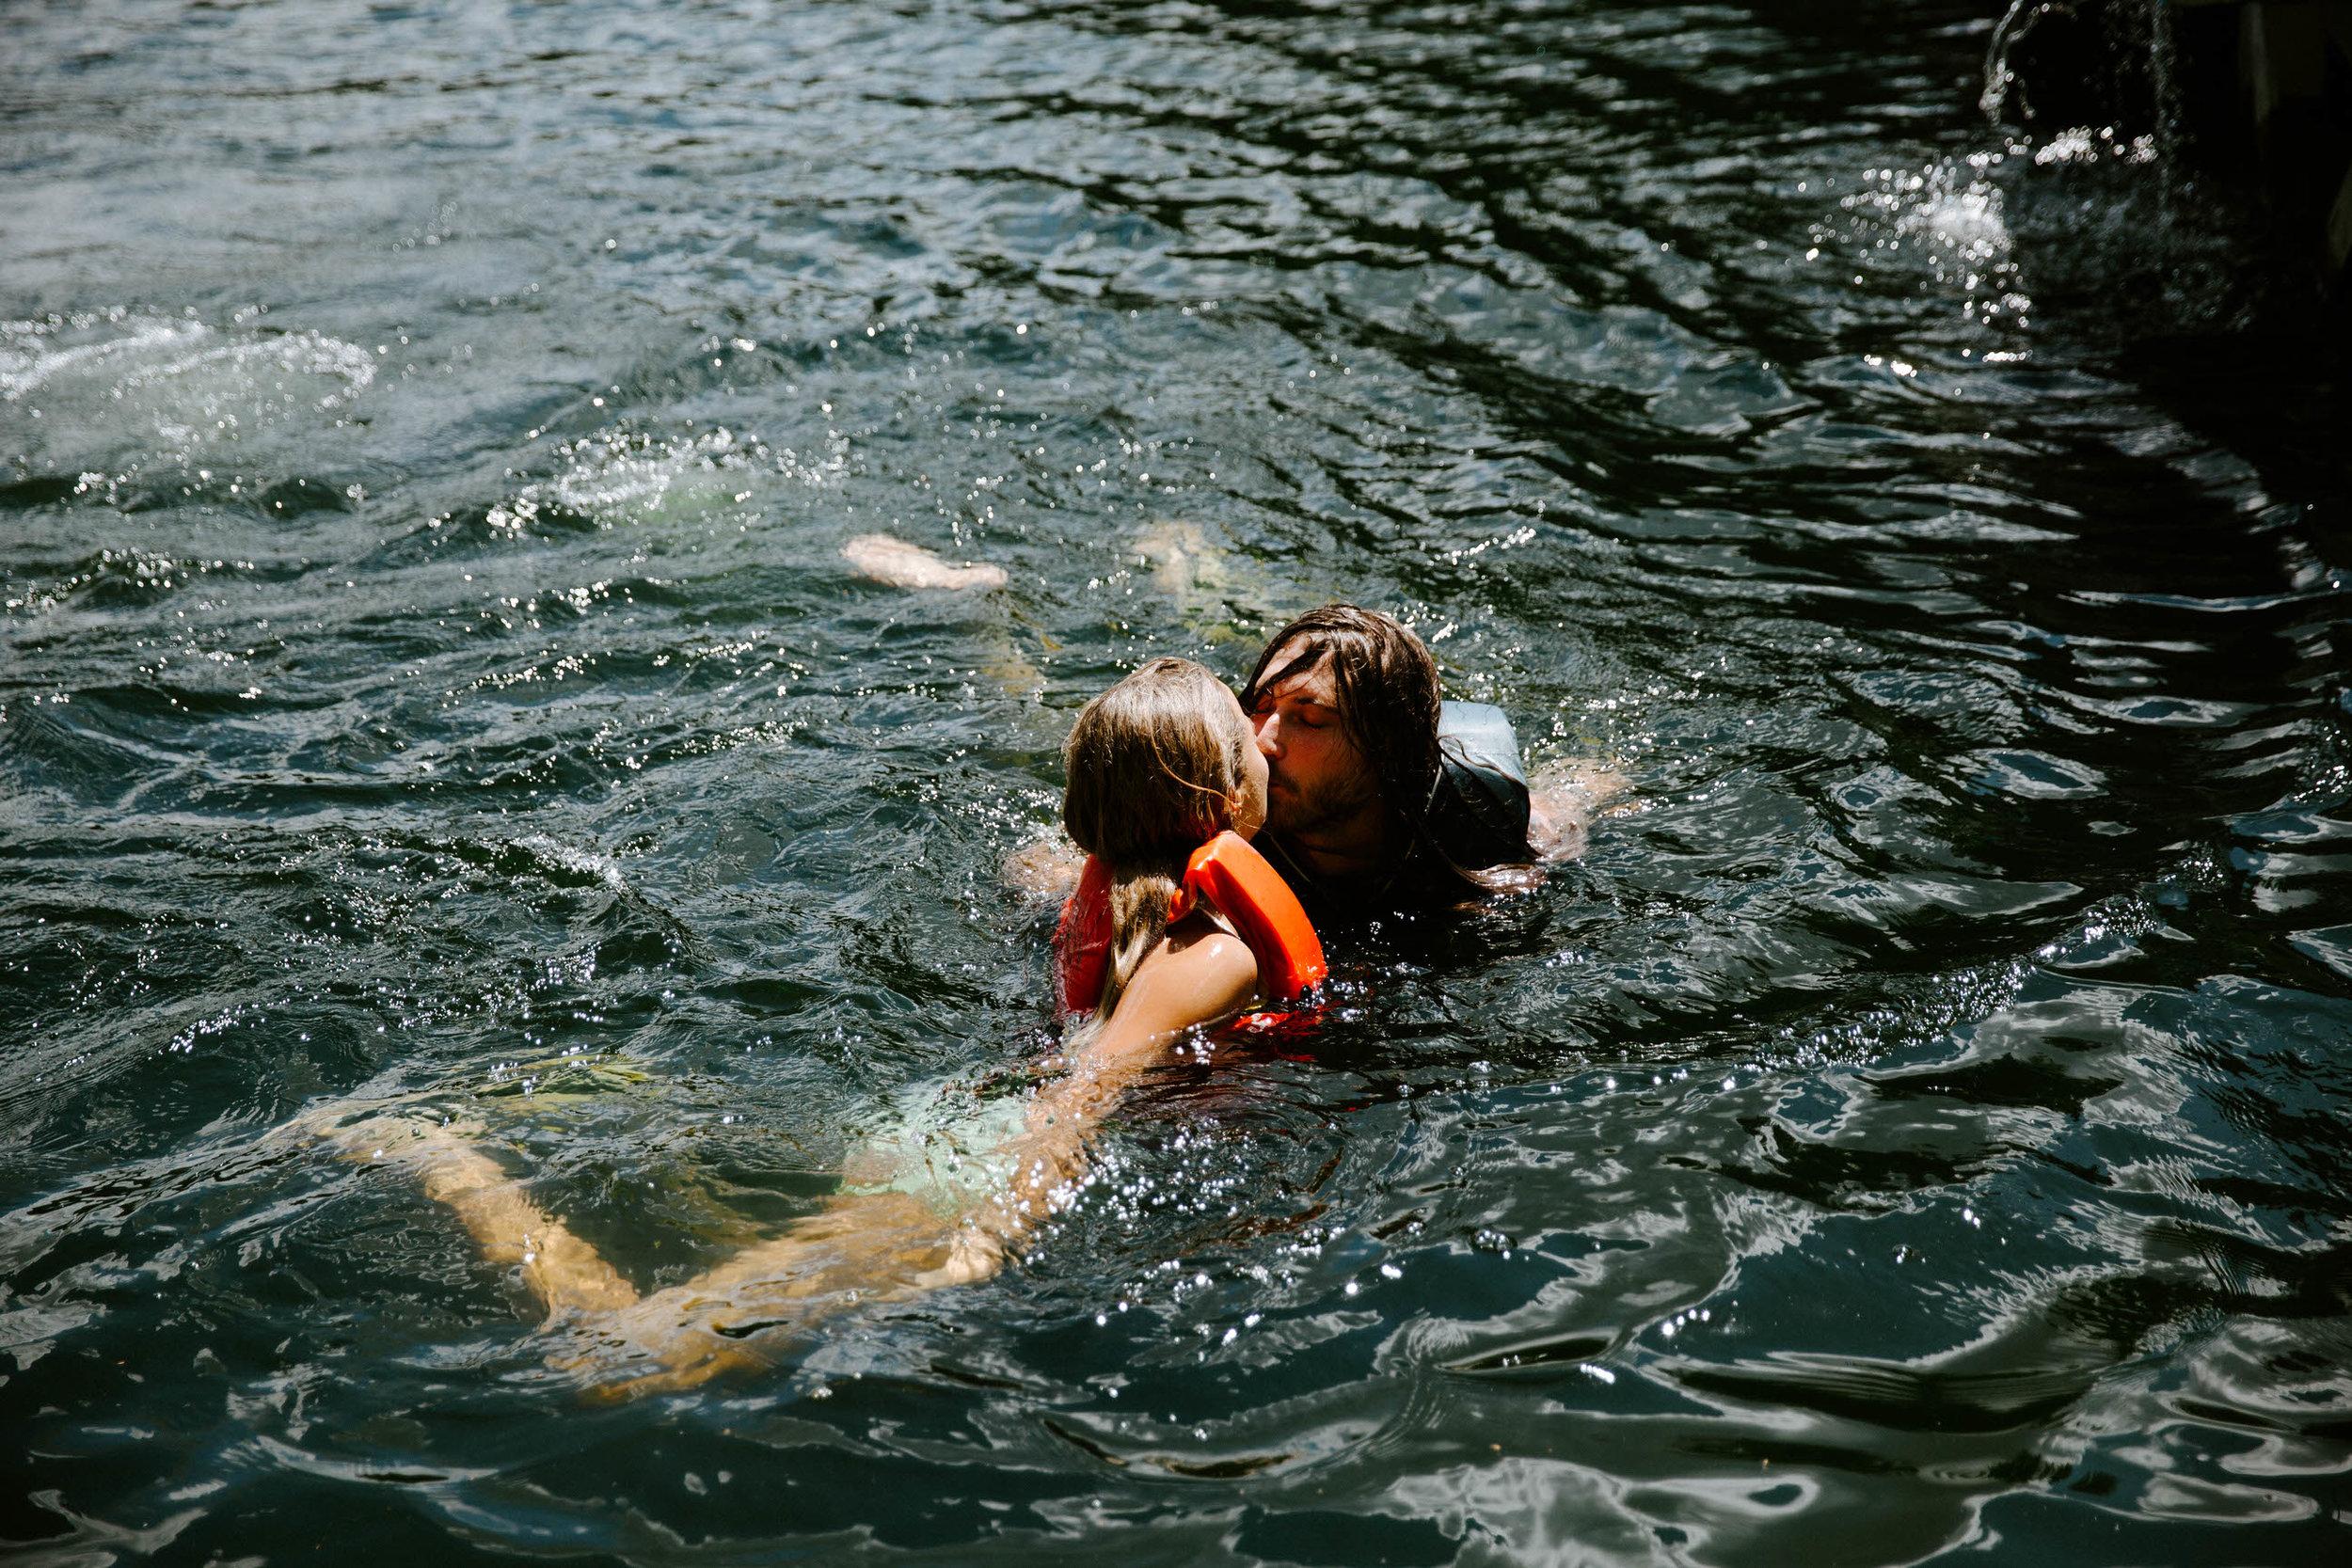 jeremy+elle-Lake-0910.jpg